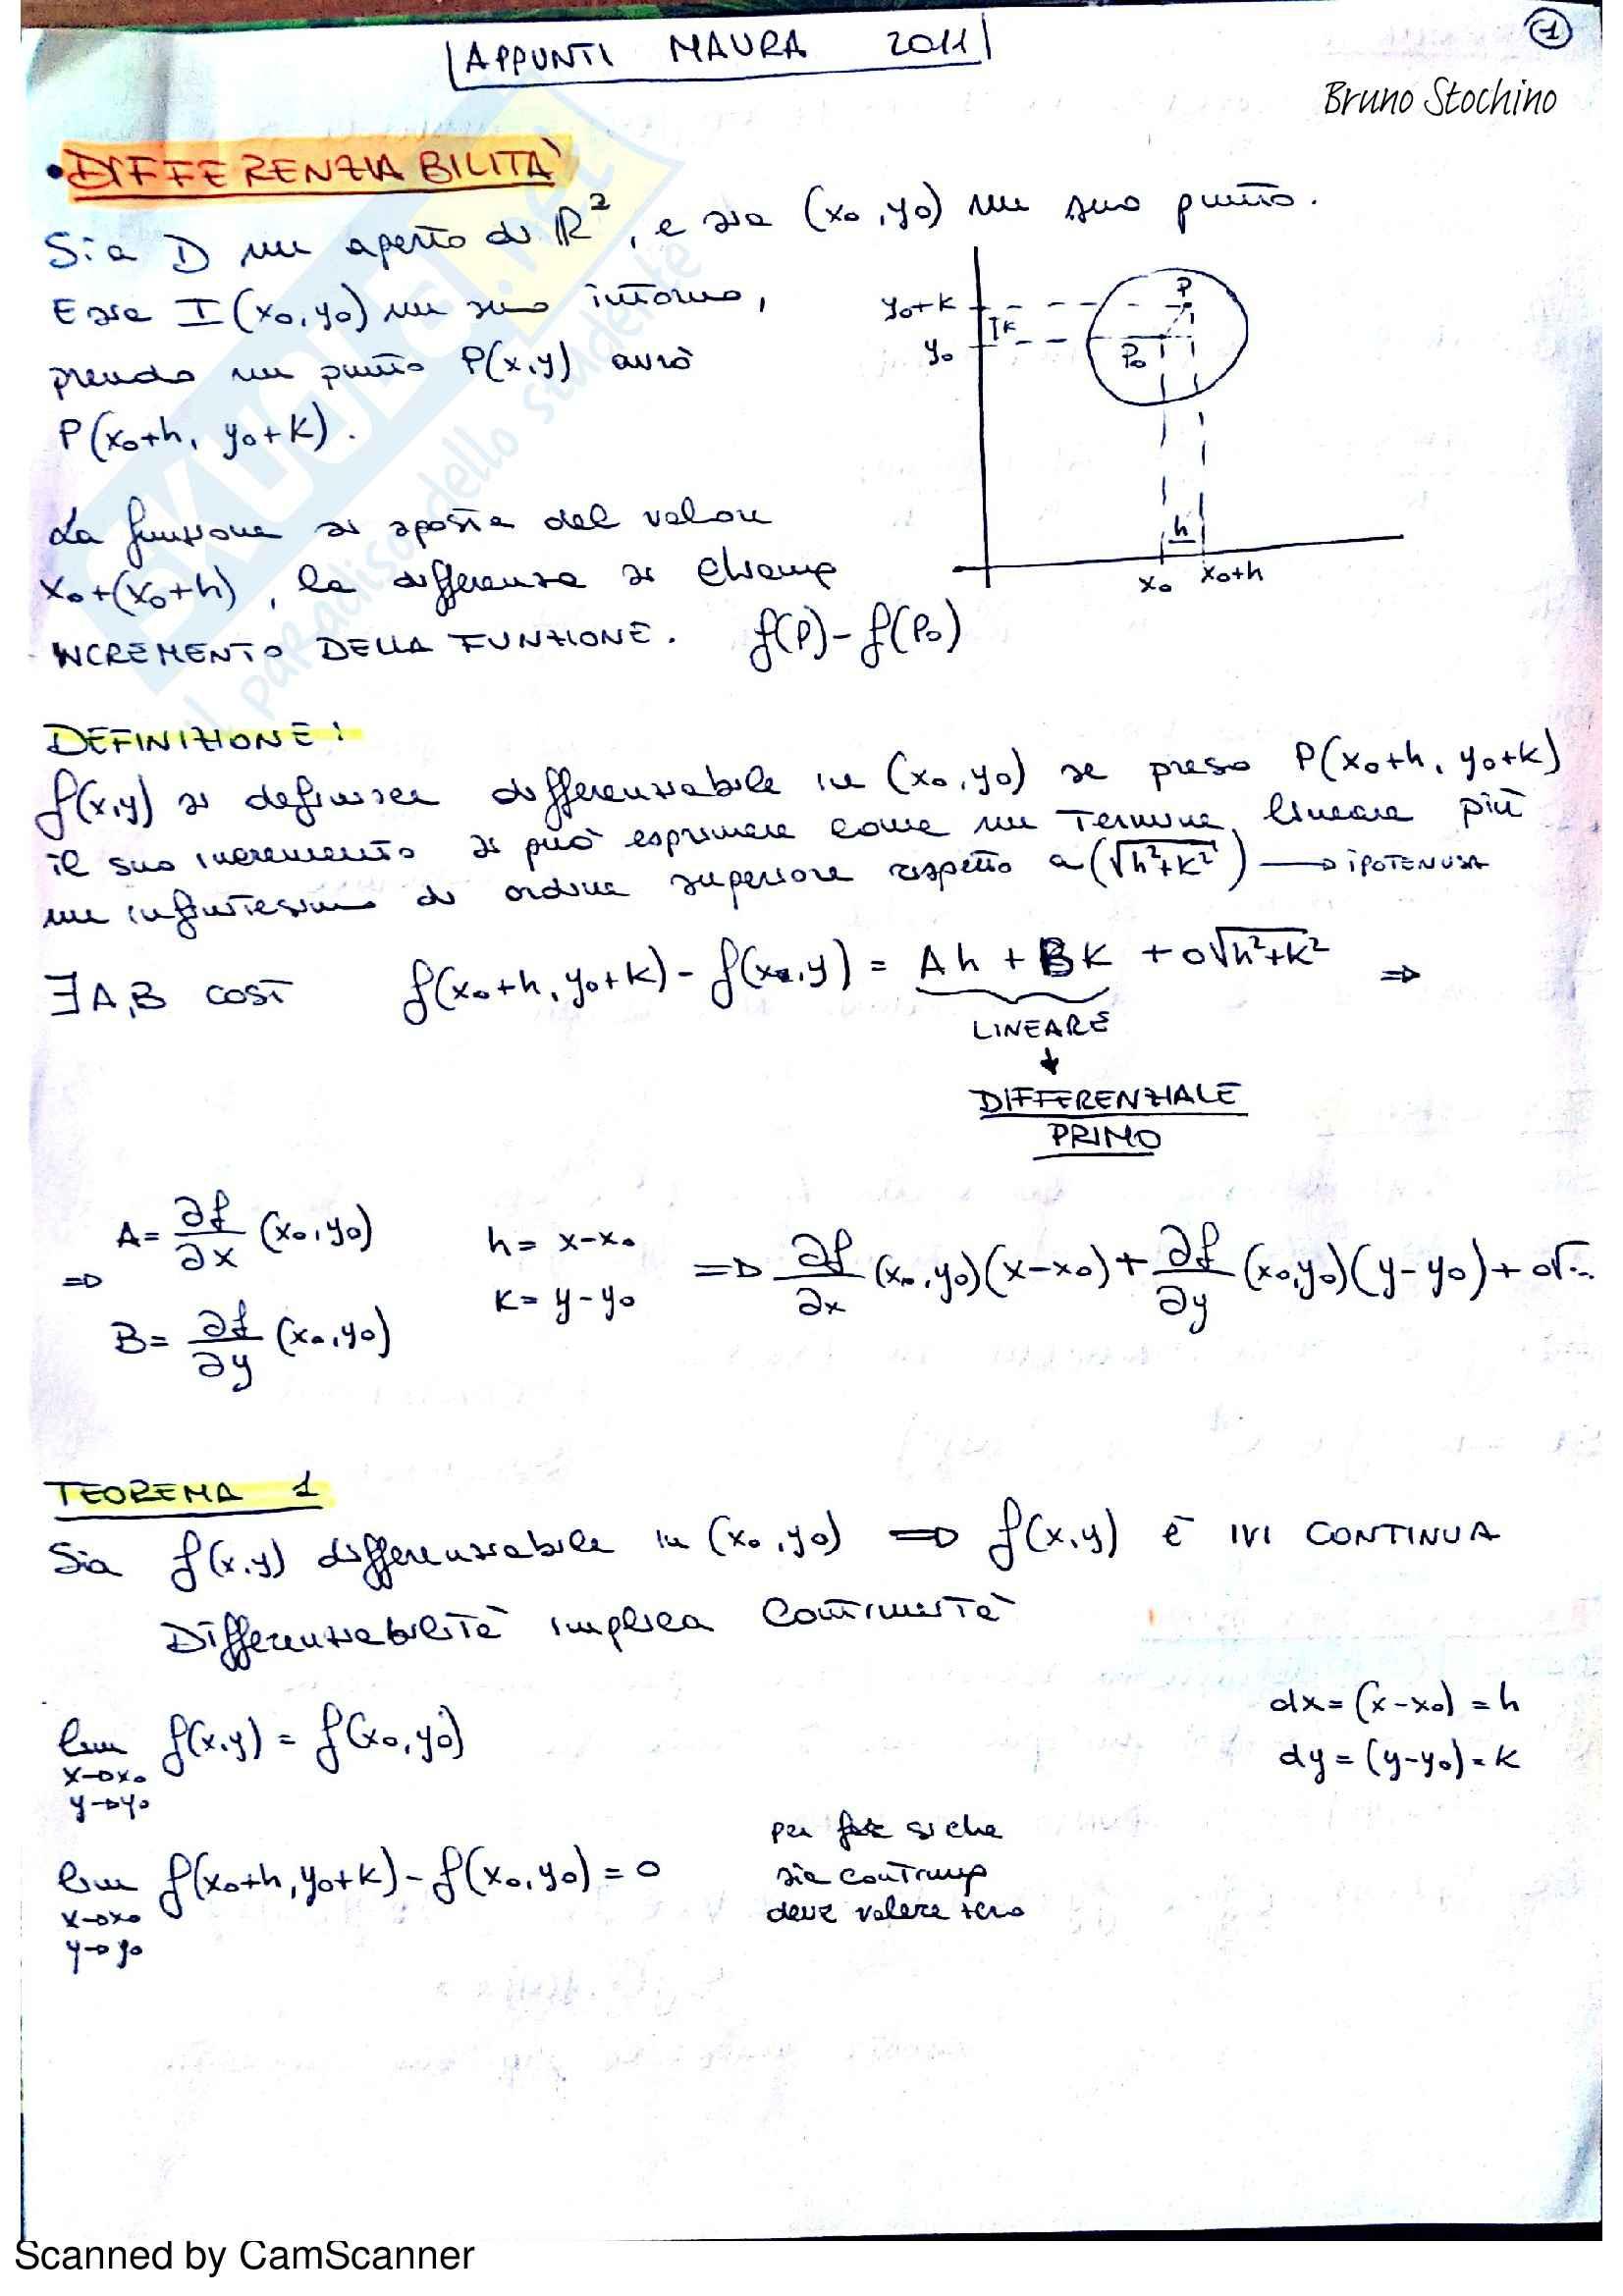 Analisi 2, sintesi e teoremi